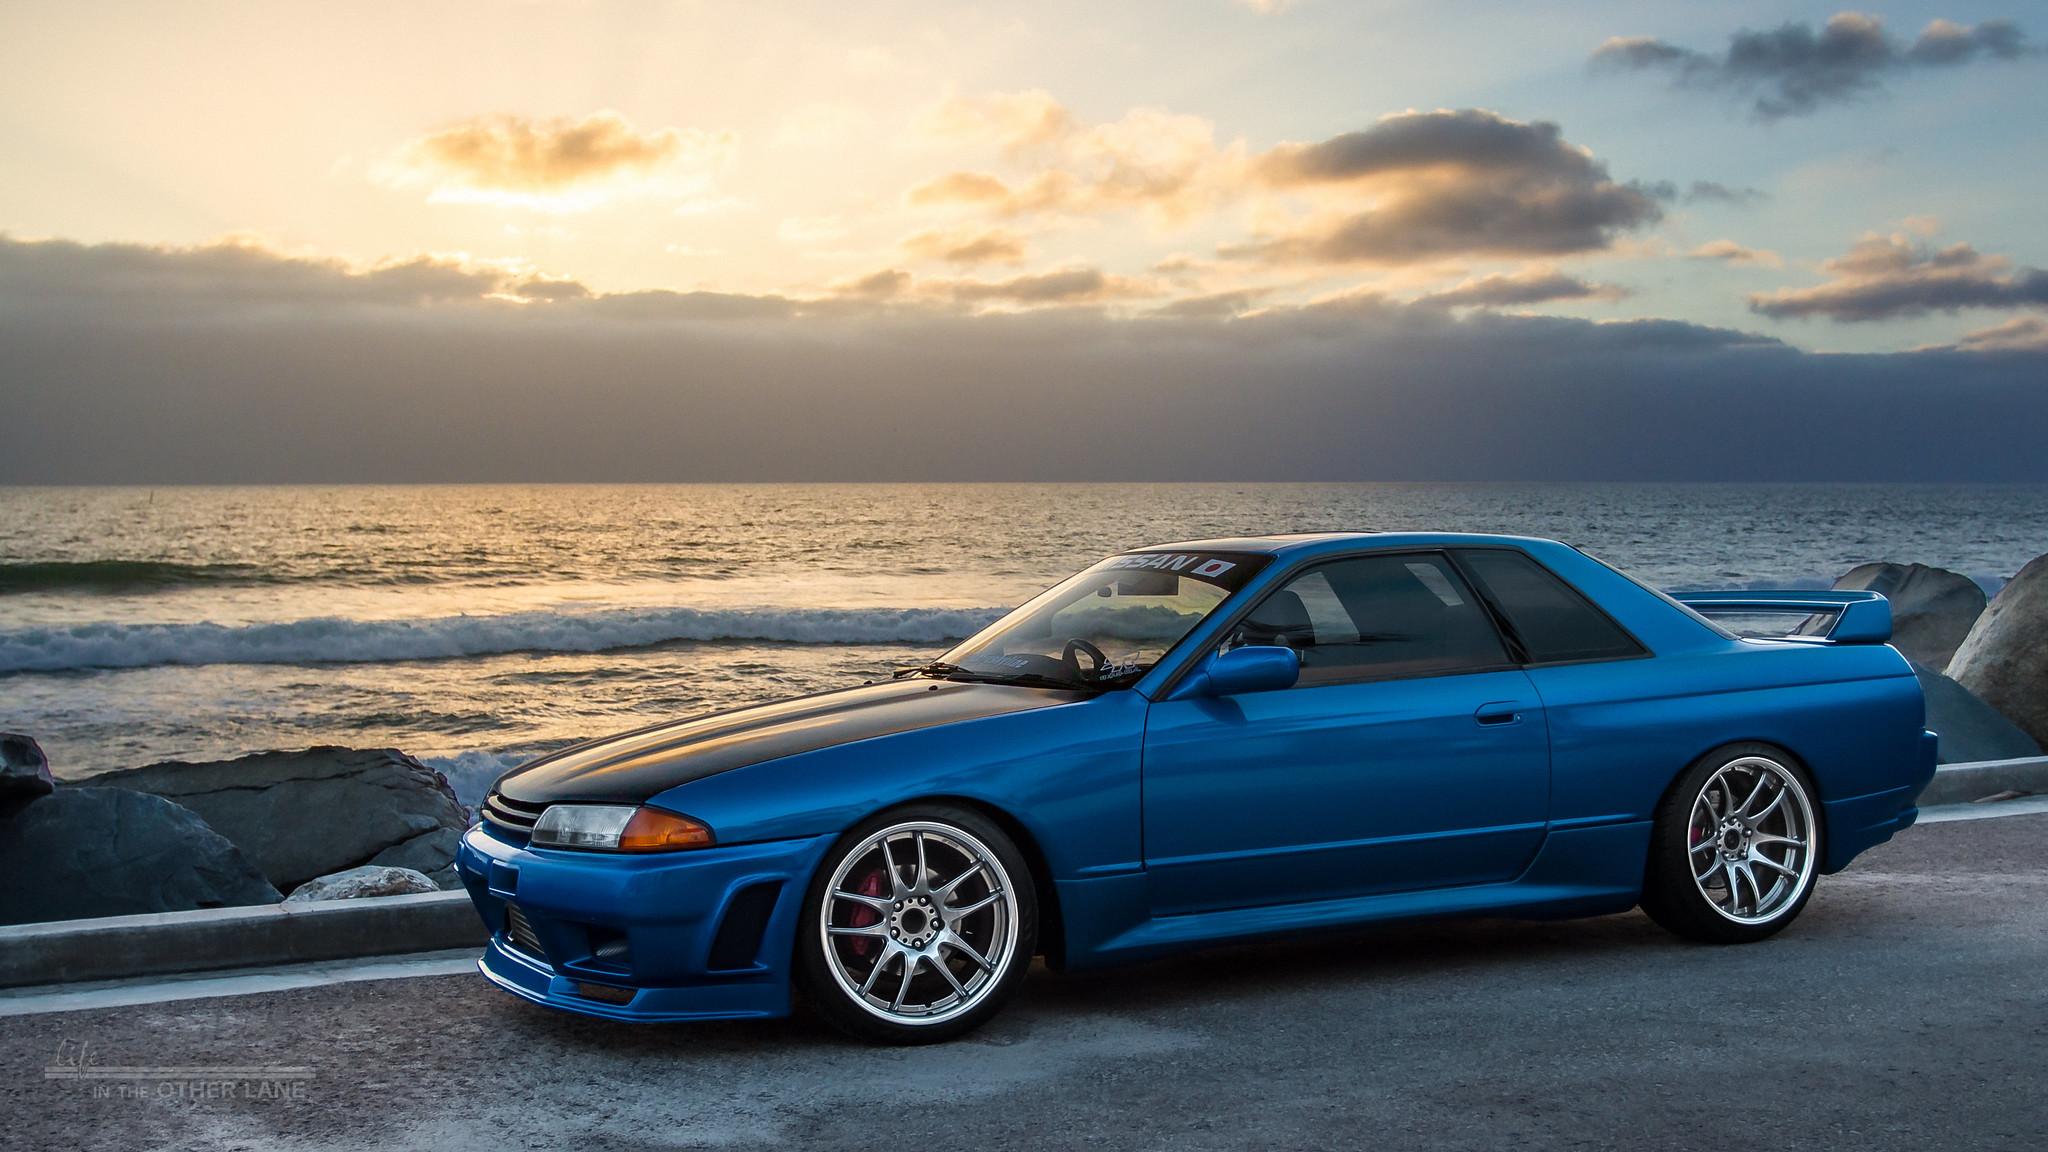 Subaru Dealers Near Me >> WORK Wheels USA Subaru STI on WORK Emotion T7R 2P (18″) in ...